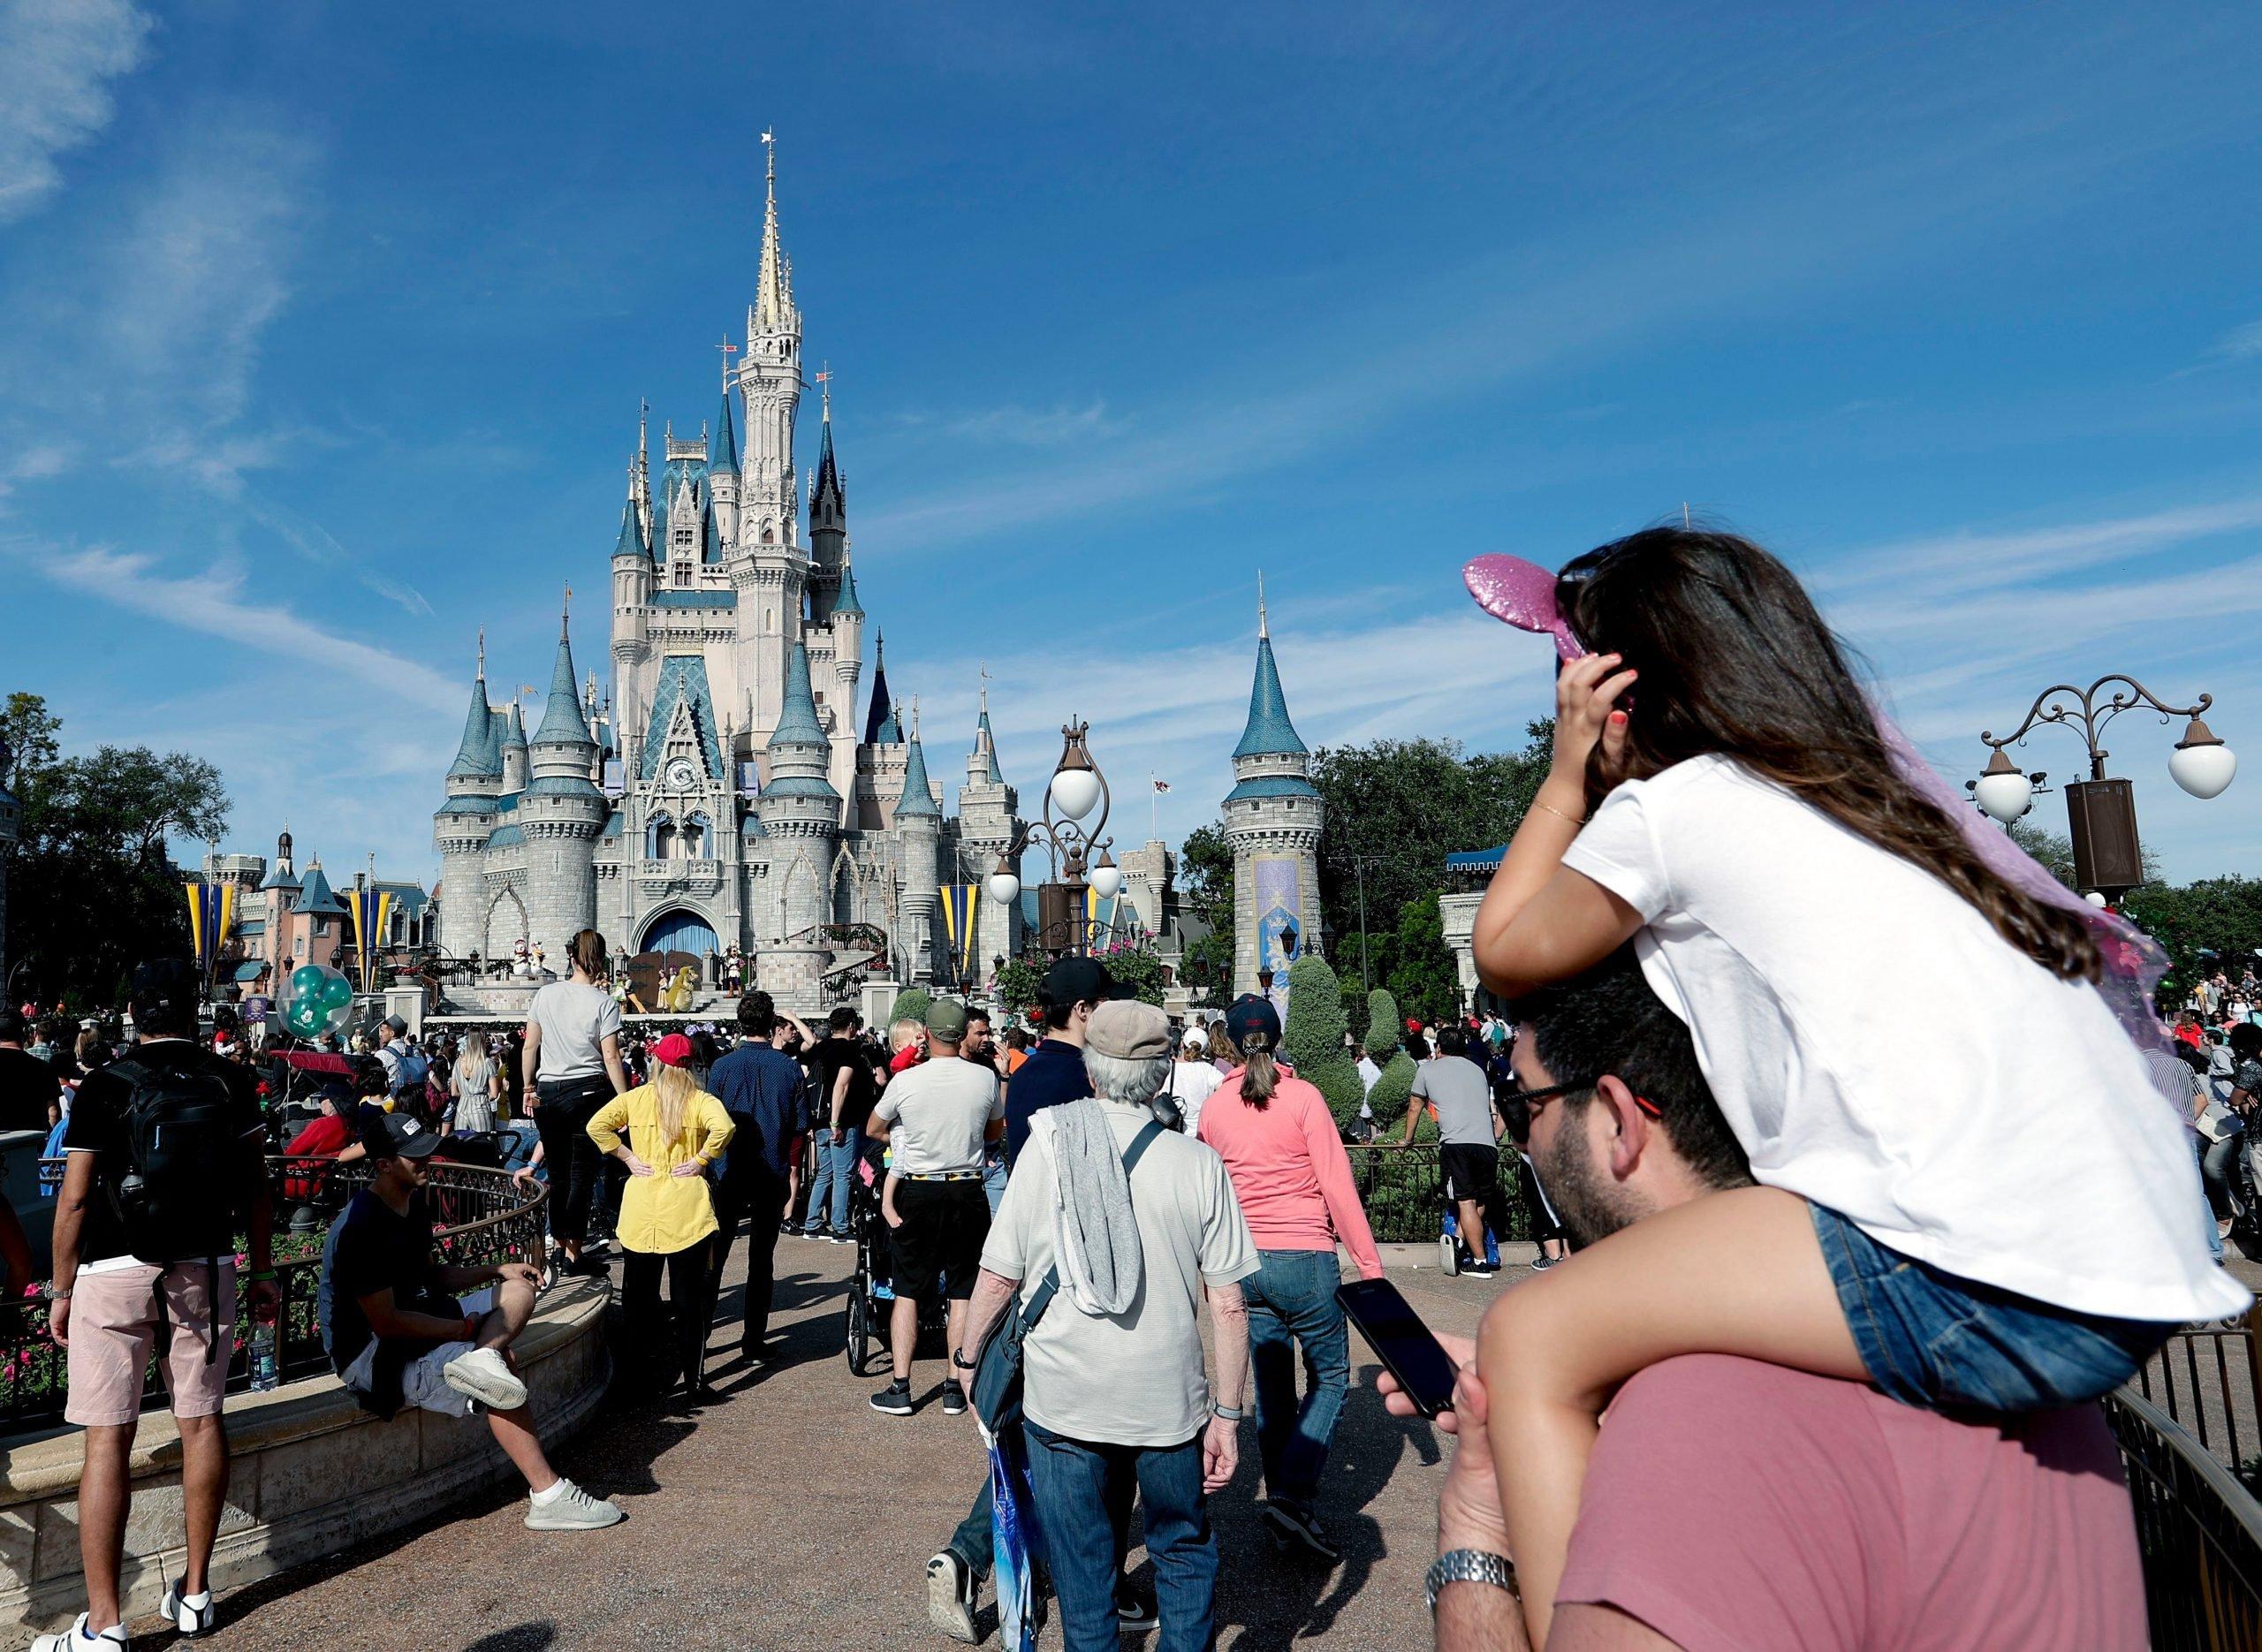 Disney World Magic Kingdom, Lake Buena Vista, USA - 09 Jan 2019